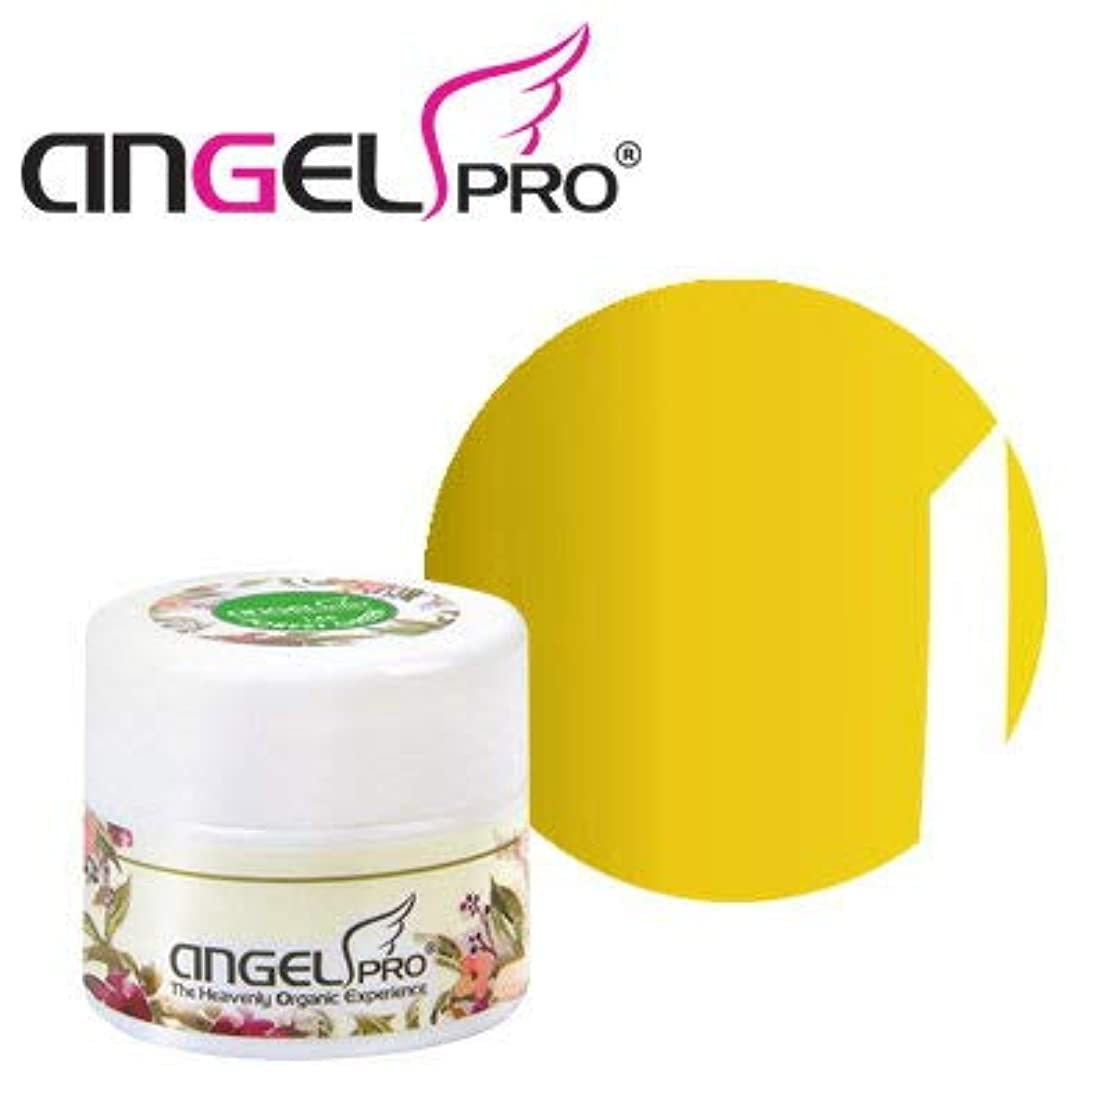 ANGEL PRO ポットジェリー #146 LEMON TART 4g